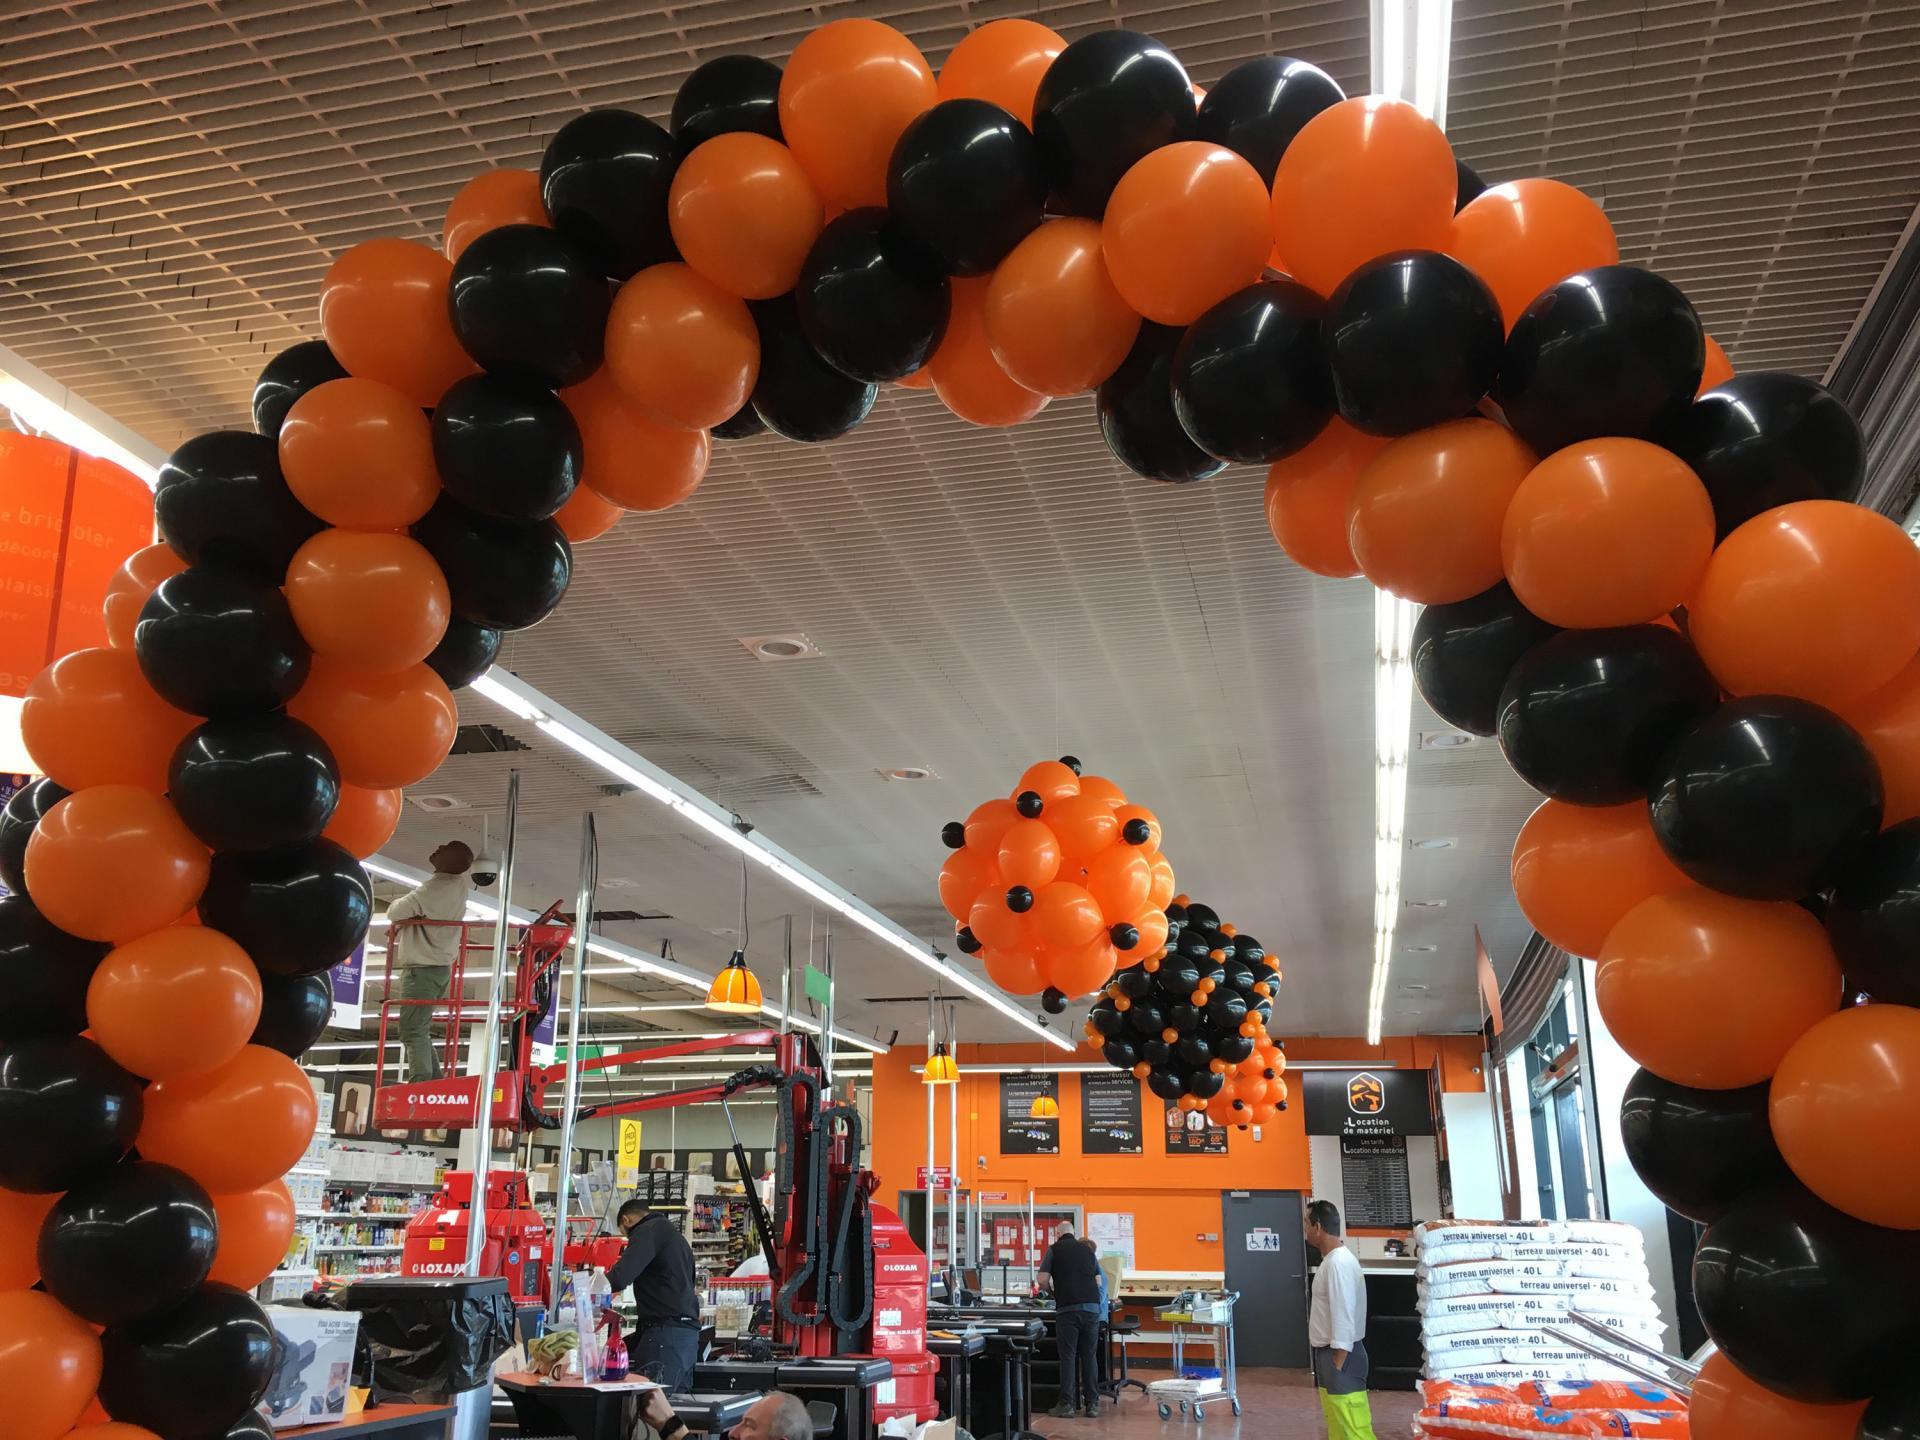 Inauguration magasin avec ballons